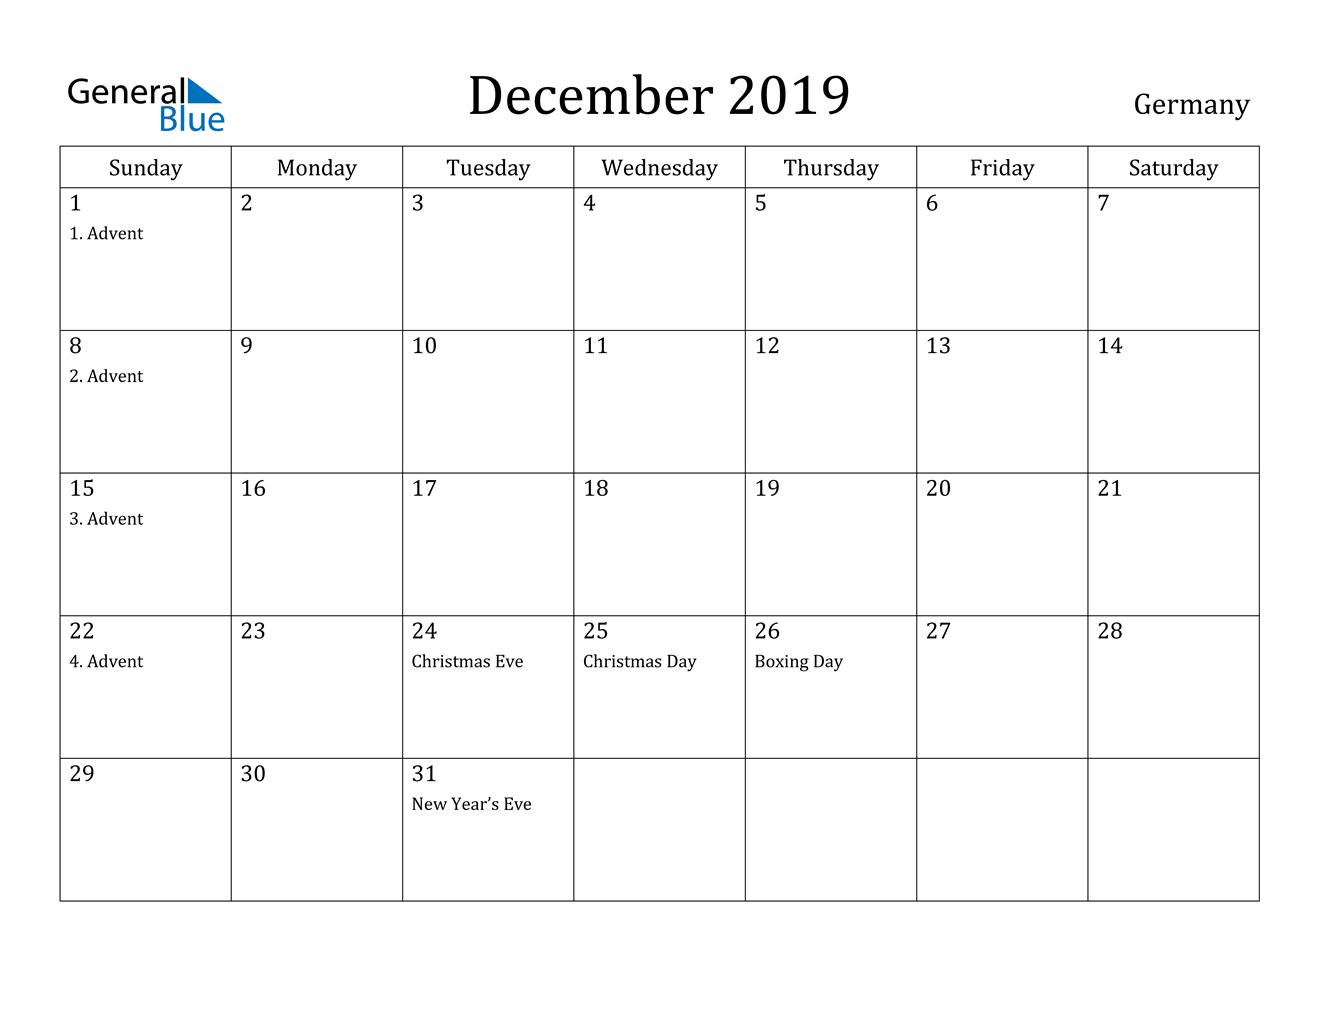 Image of December 2019 Germany Calendar with Holidays Calendar